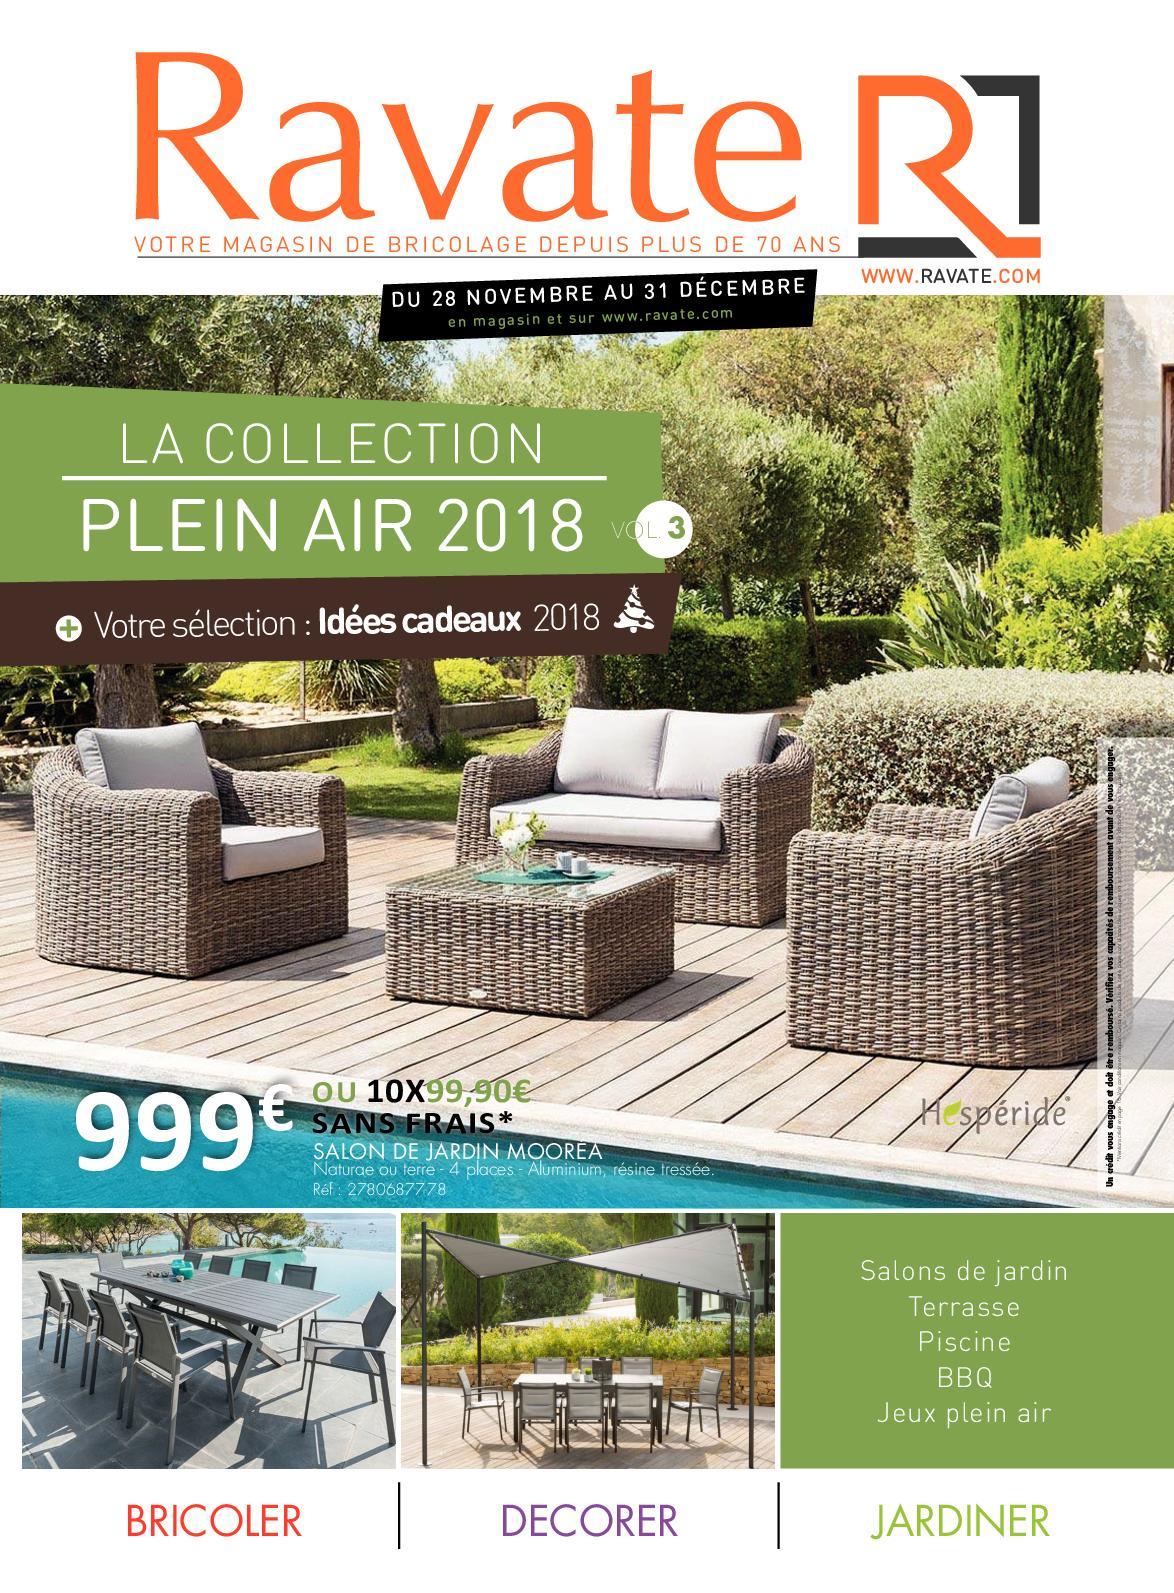 Calaméo - Collection Plein Air 3 Ravate Brico tout Salon De Jardin Moorea